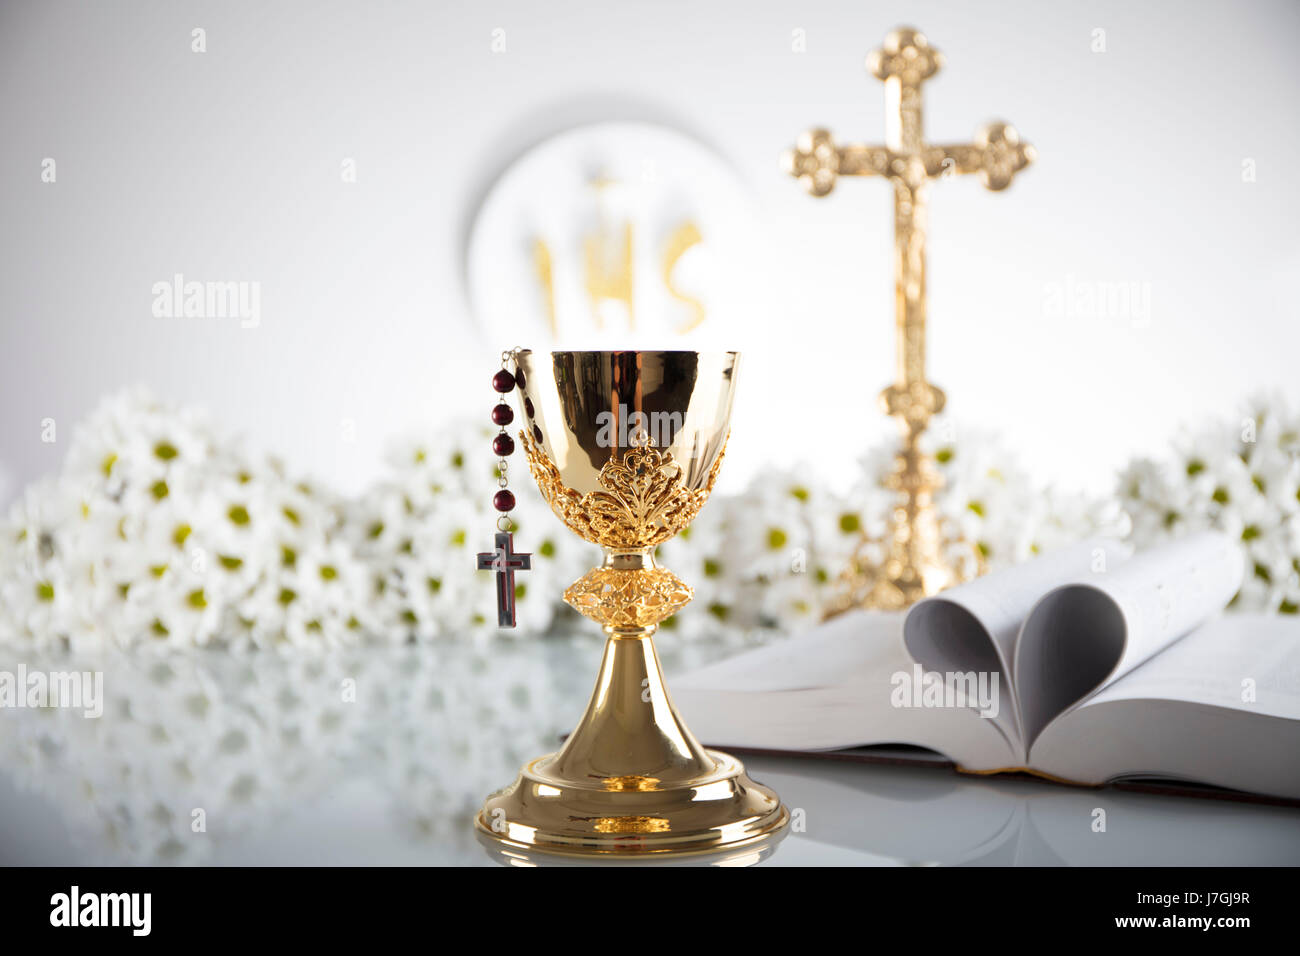 Erste Religion